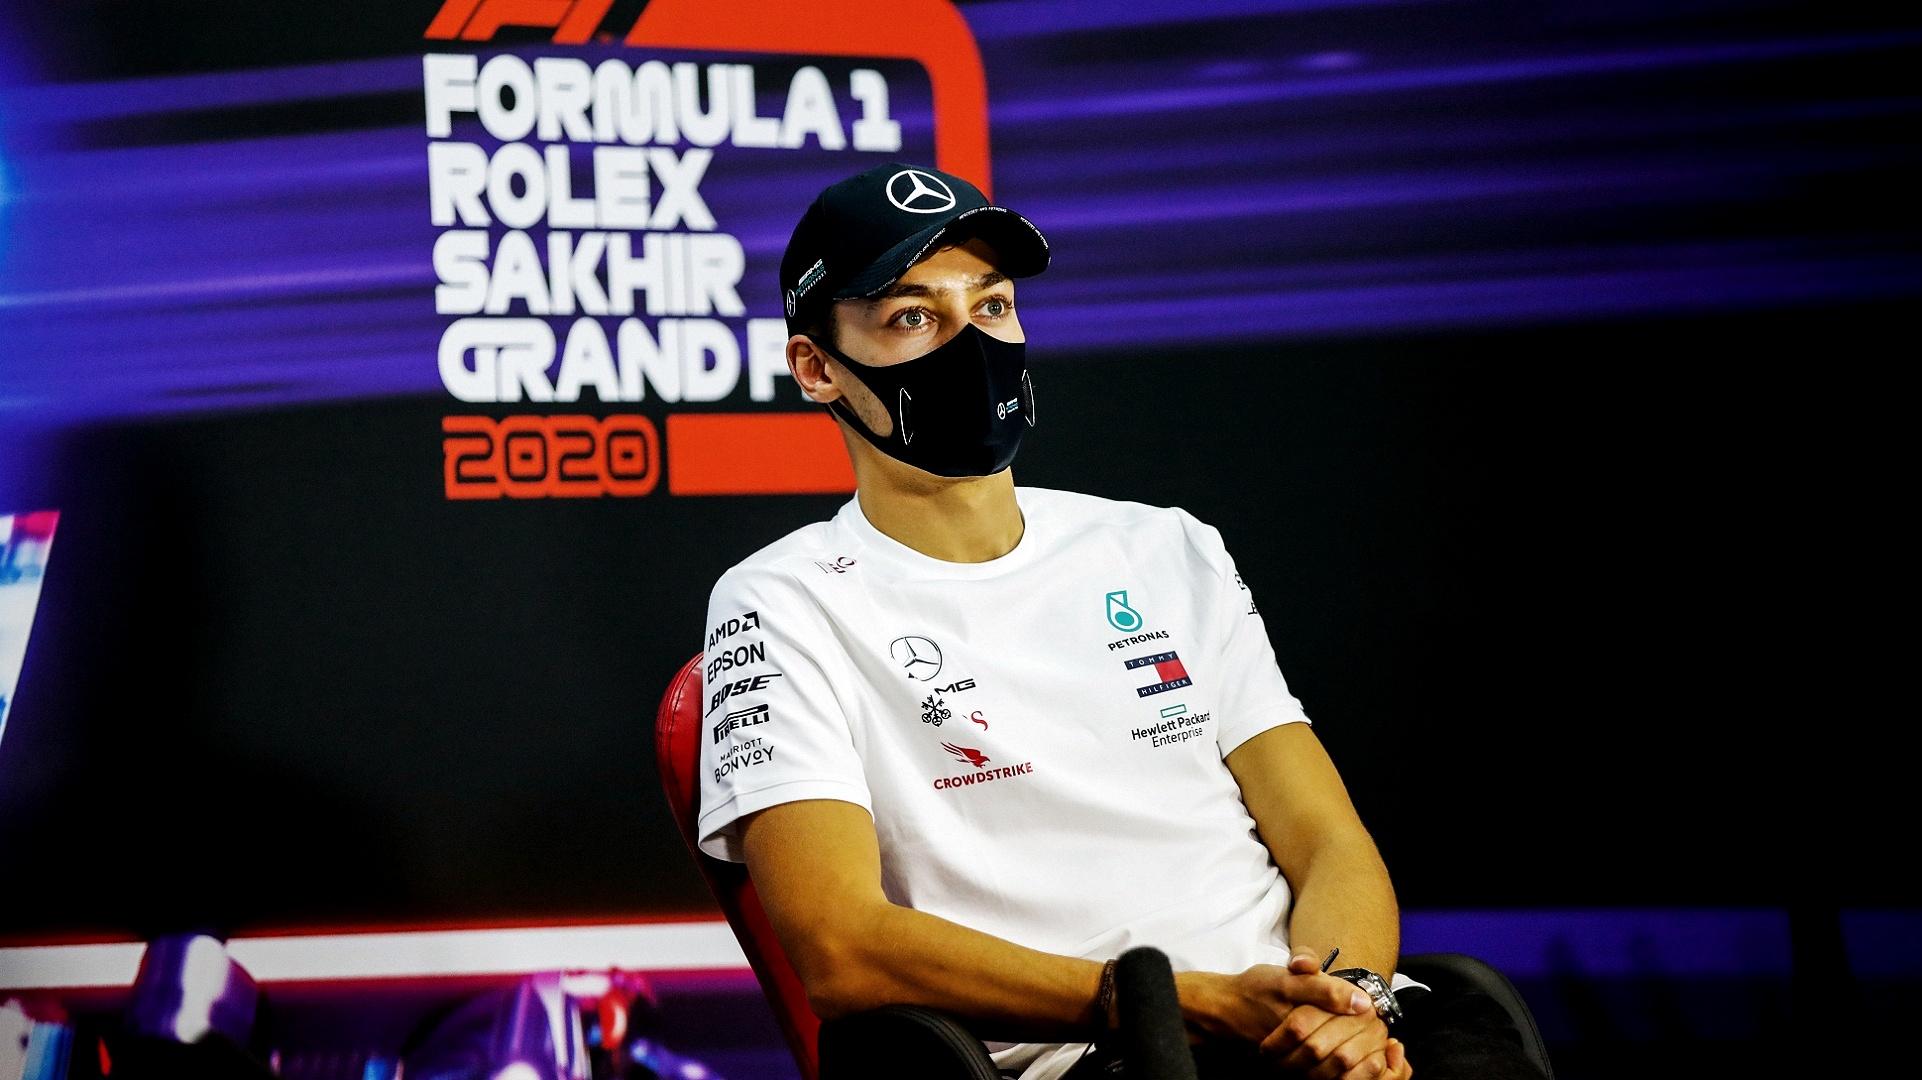 2020-12-05 Russell F1 Formula 1